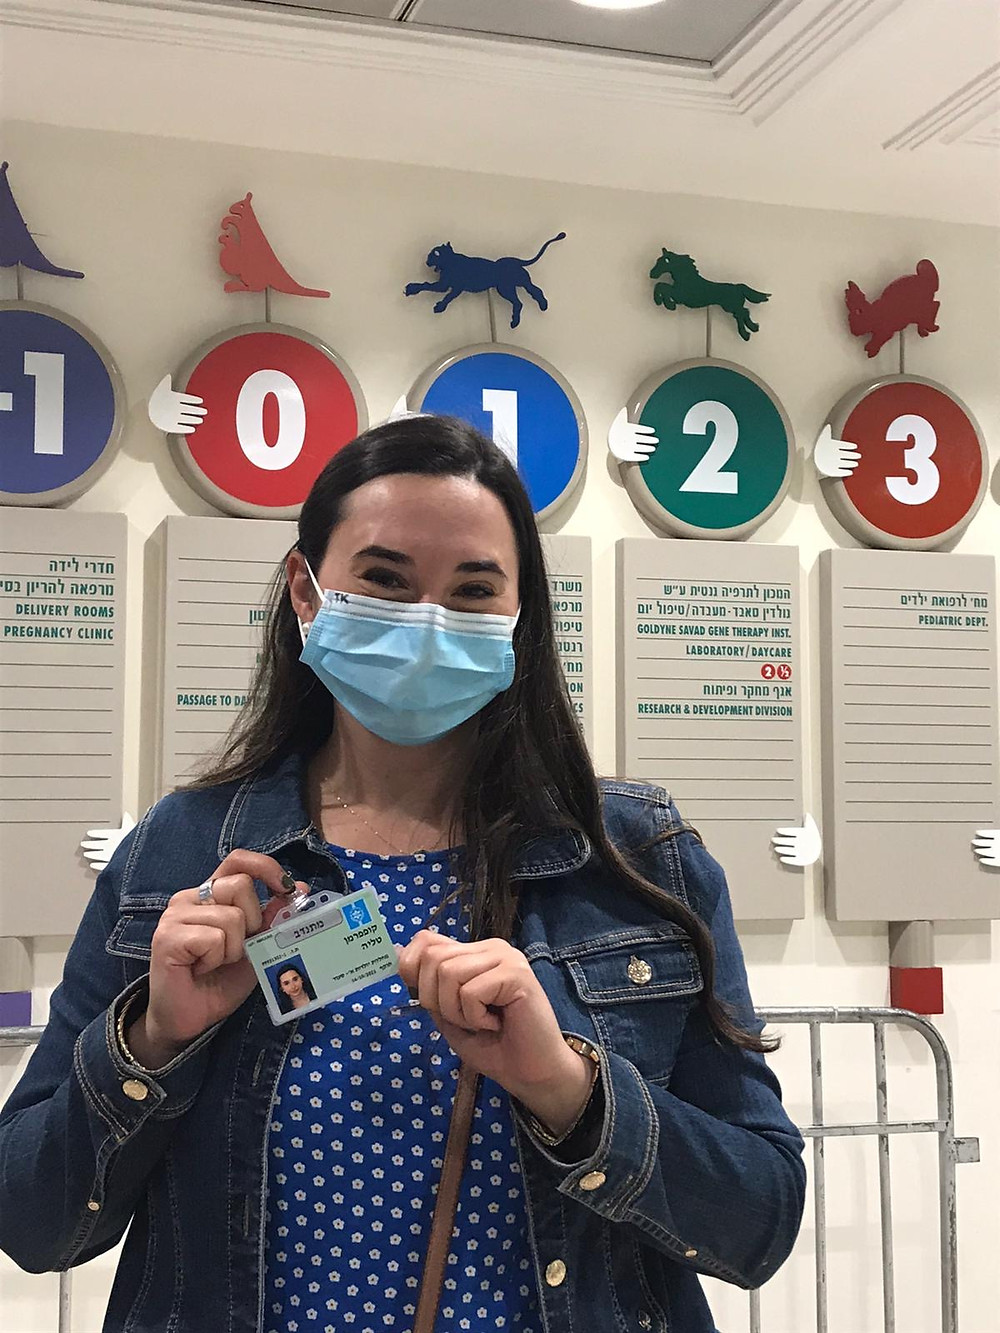 Talia Kupferman holding her ID card for Hadassah Ein Karem Hospital in Jerusalem - nefesh b nefesh